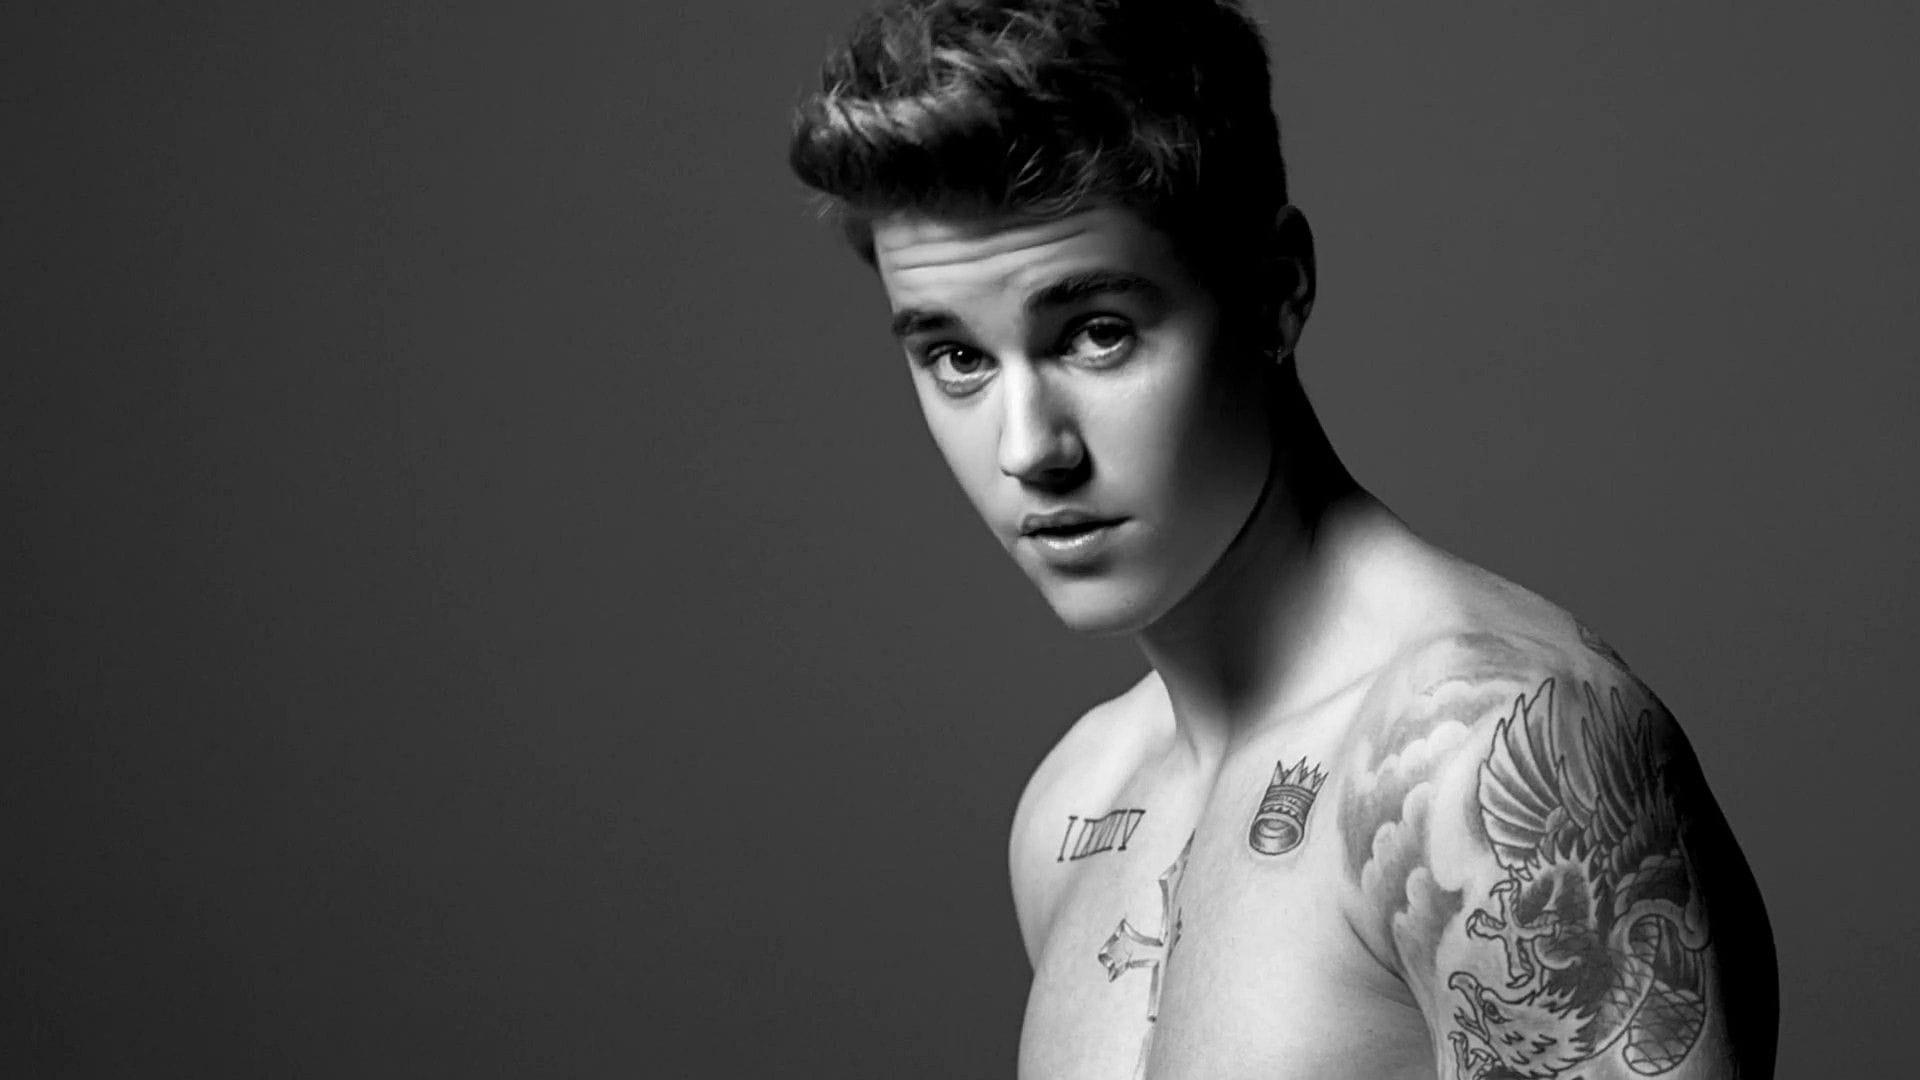 Justin Bieber widescreen wallpapers